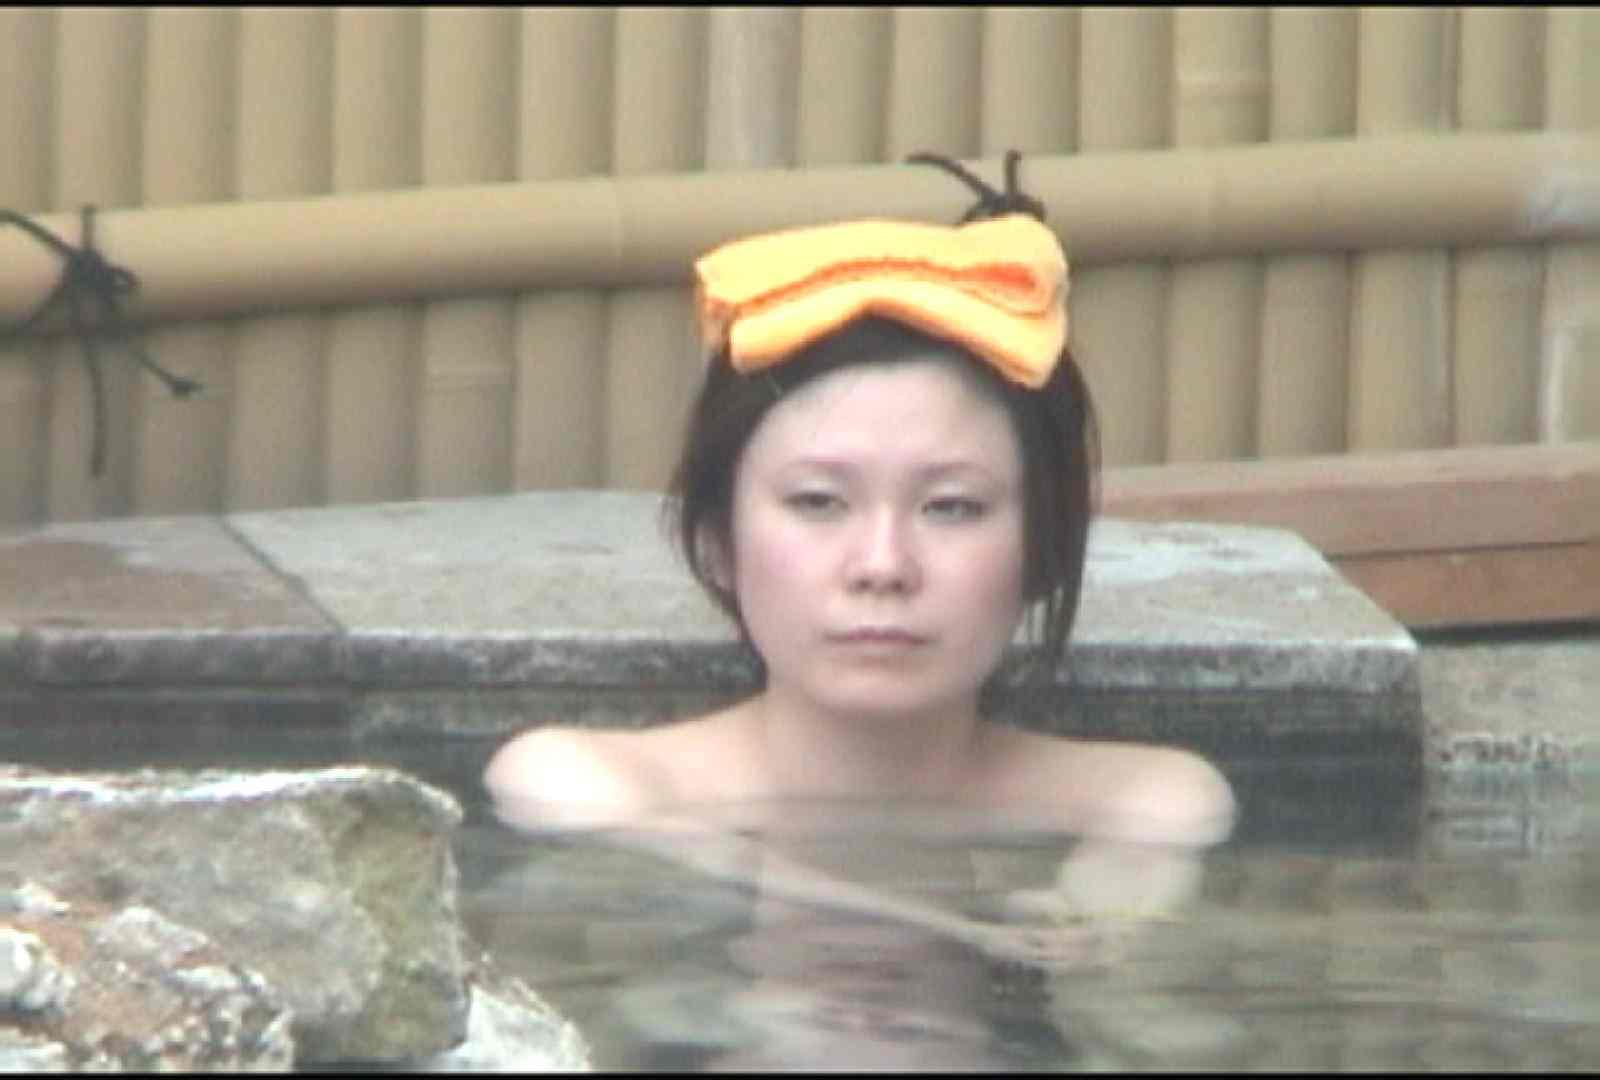 Aquaな露天風呂Vol.177 盗撮師作品  102pic 60